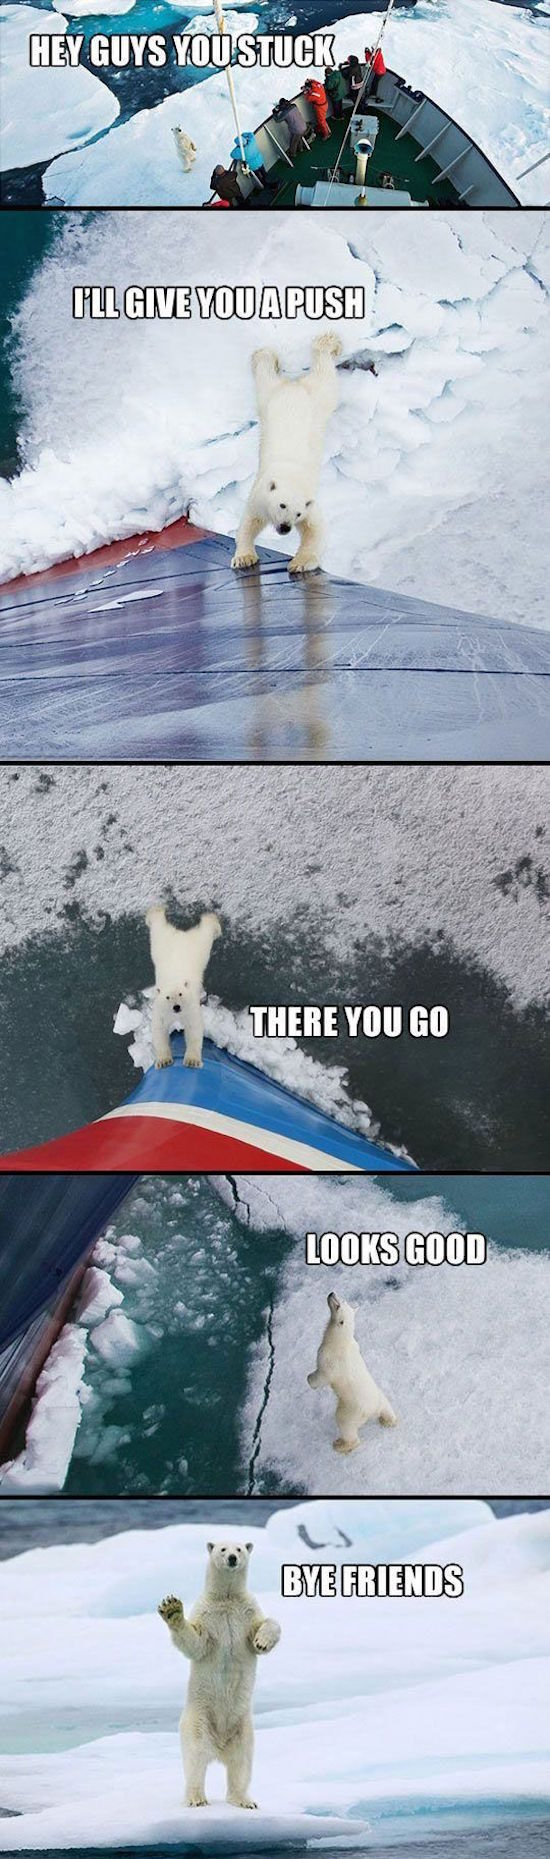 cute photos of polar bear helping a boat